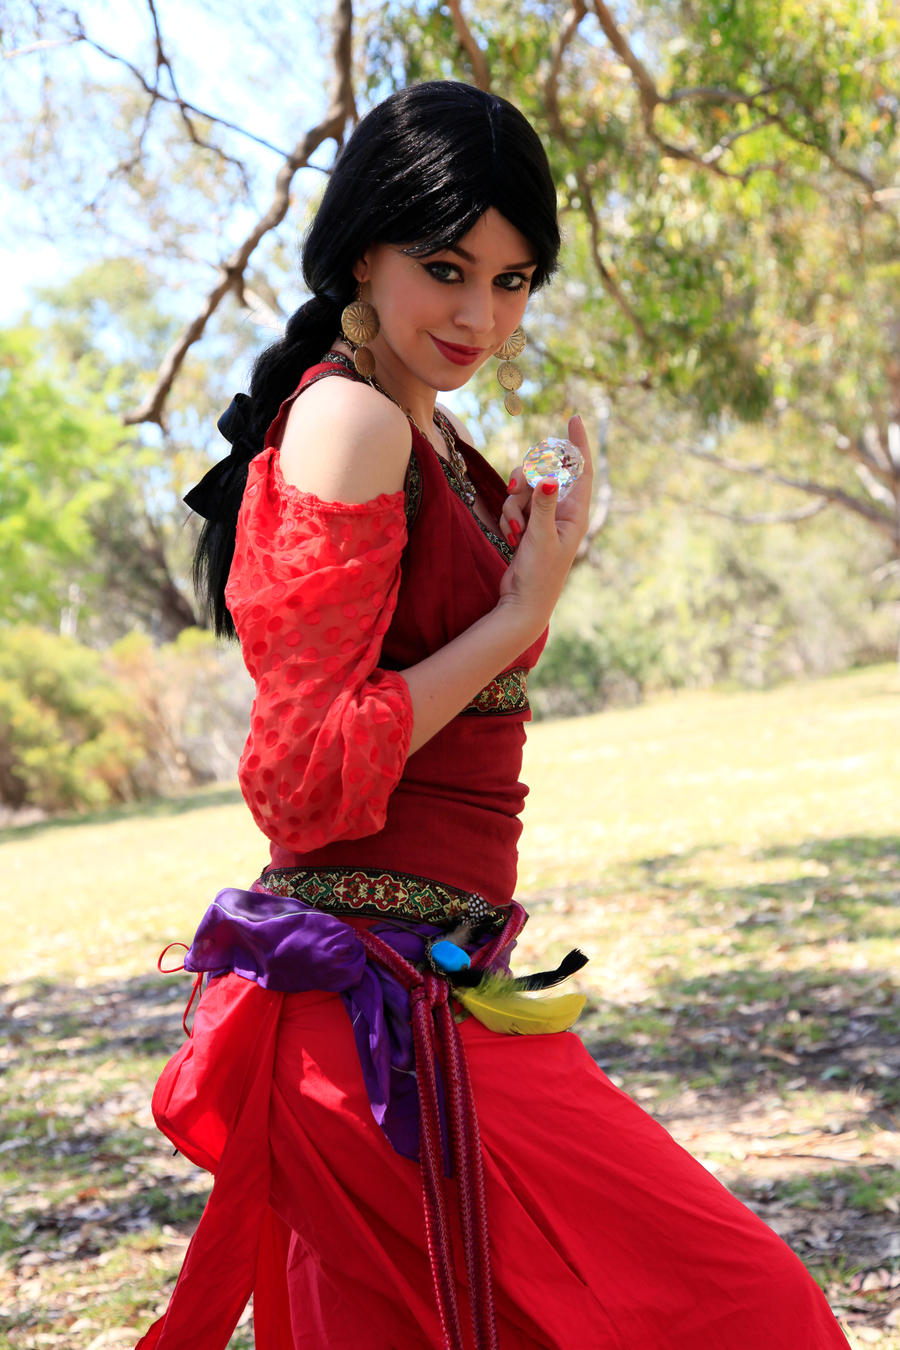 Gypsy dating rules